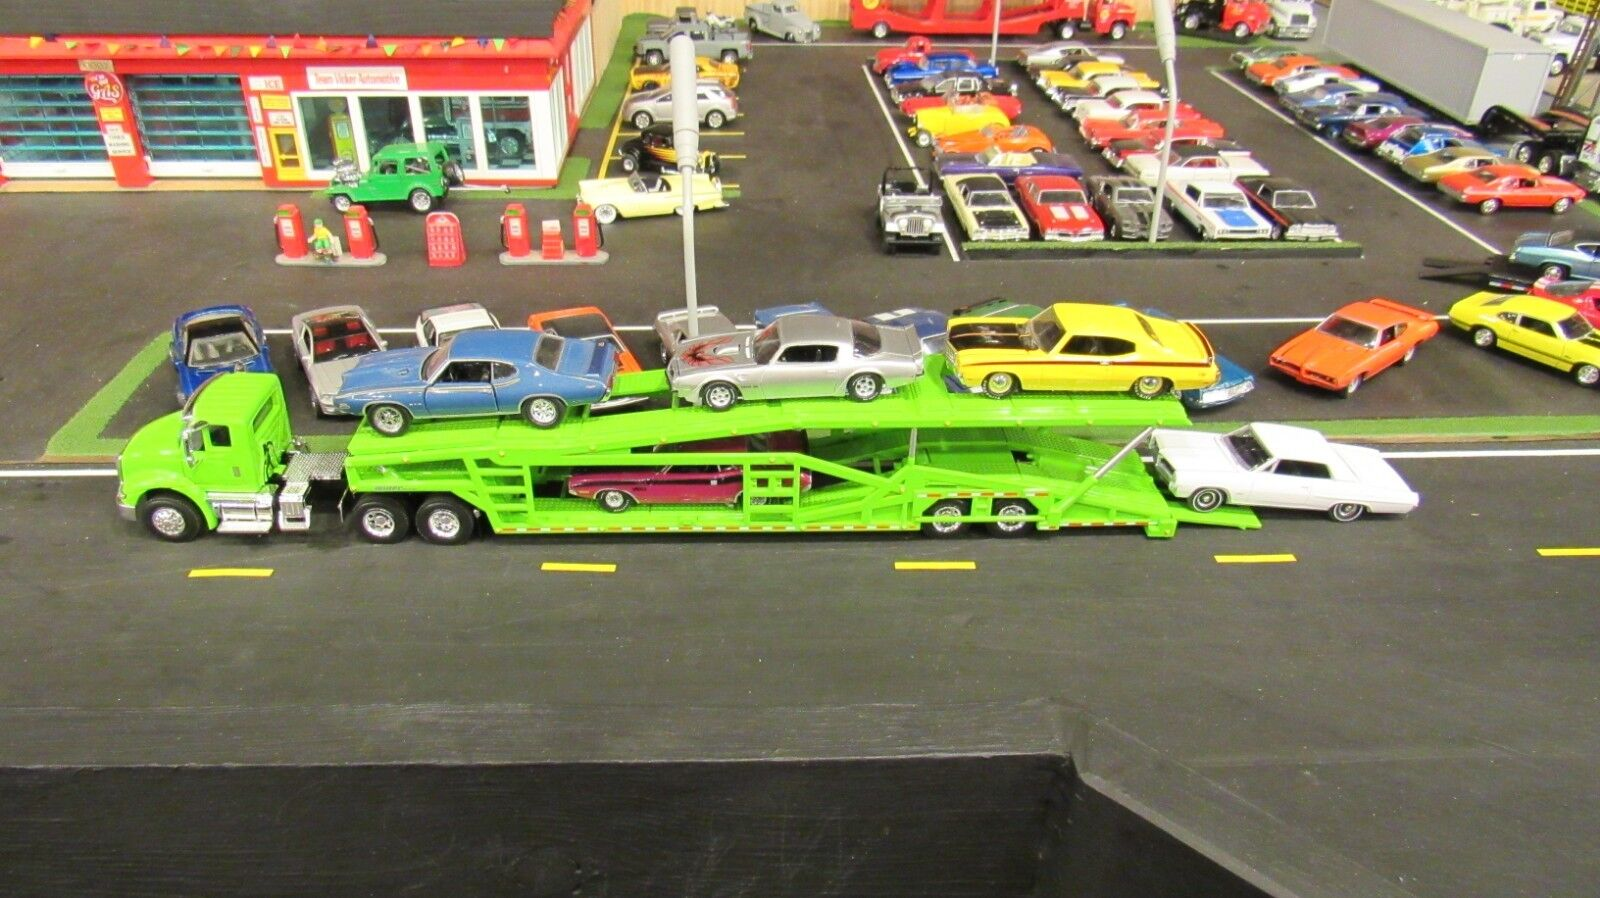 SPECCAST vert IH 8600 SEMI voiture TRANSPORT  TRANSPORTER voitureRIER TRAILER 1 64  MTB  approvisionnement direct des fabricants